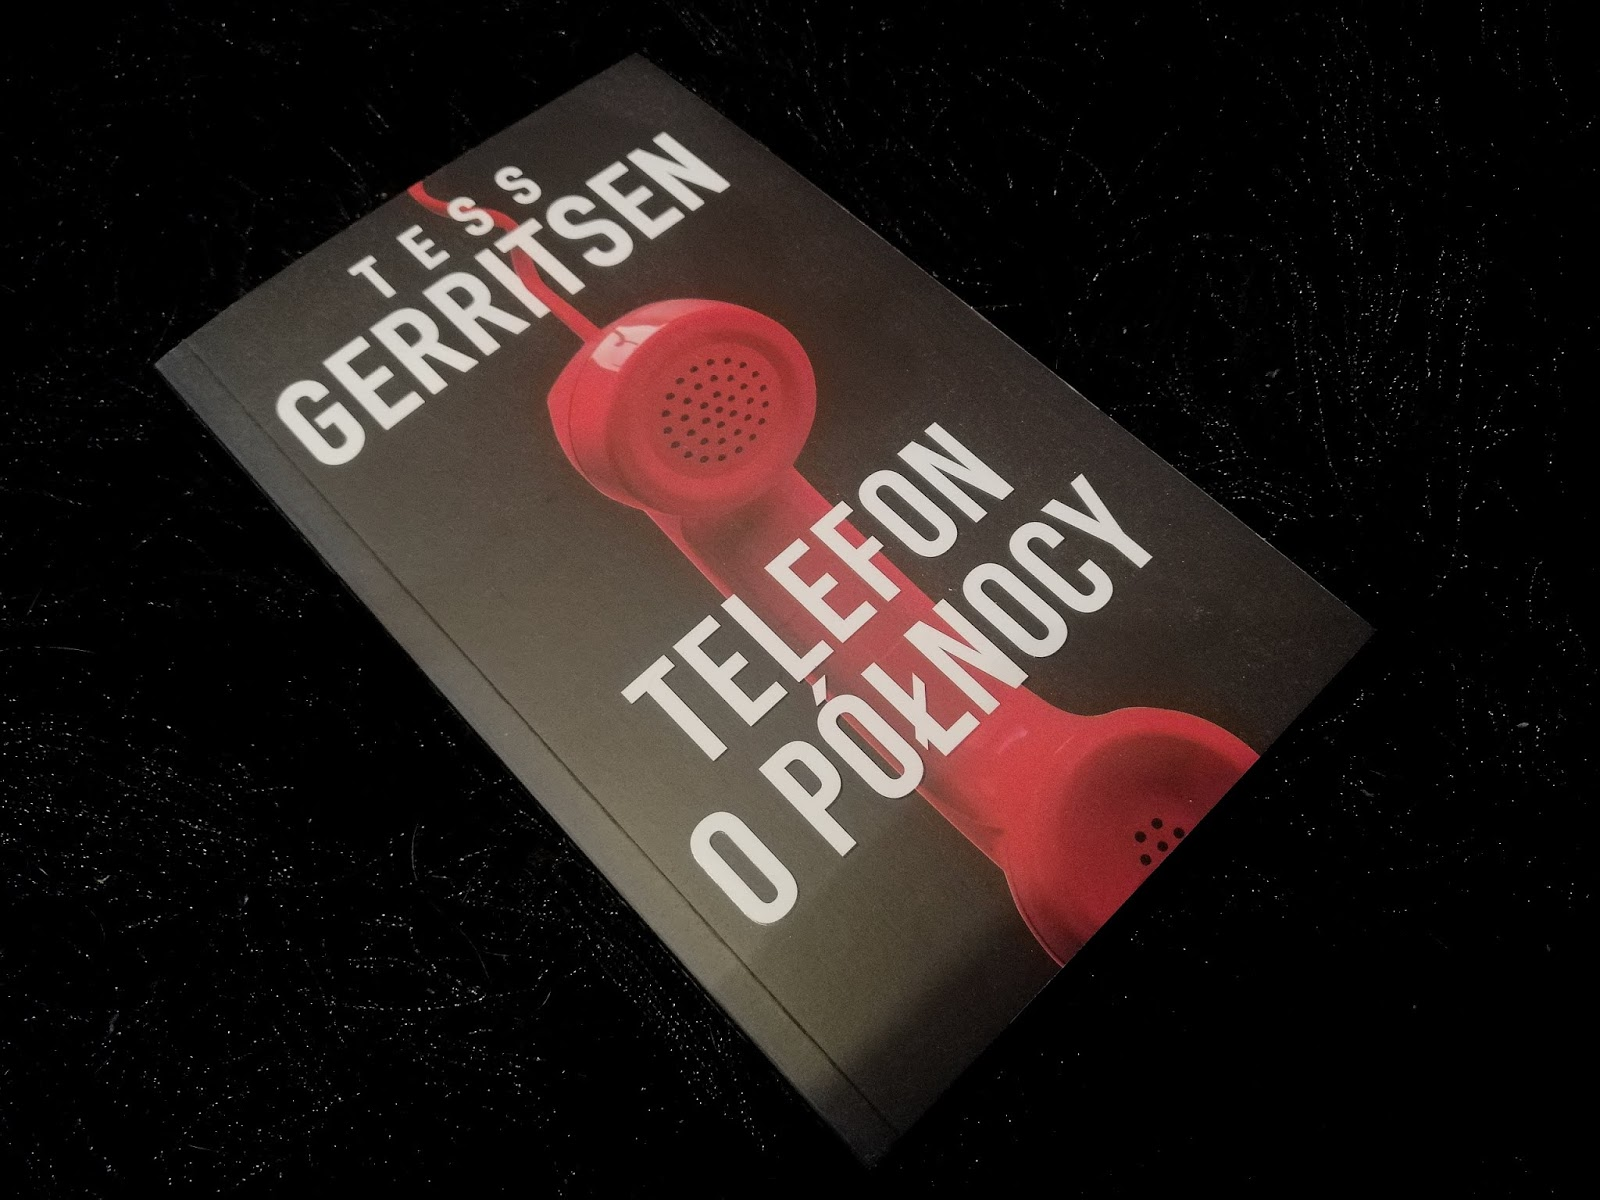 """Telefon o północy"" i ""Czarna loteria"" - Tess Gerritsen"